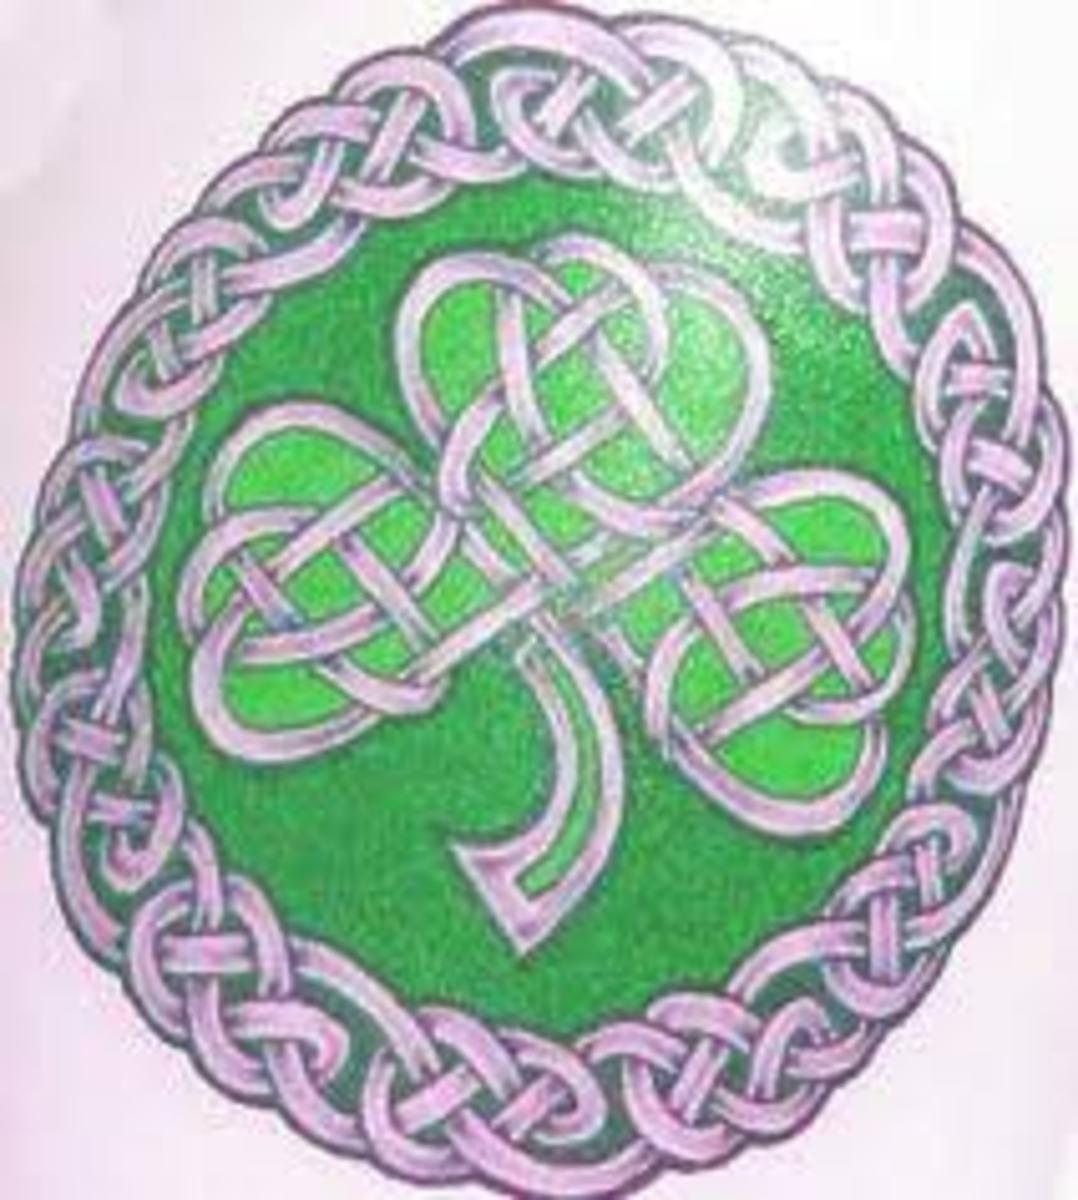 celtic-tattoos-great-ideas-for-celtic-tattoos-for-men-and-women-celtic-art